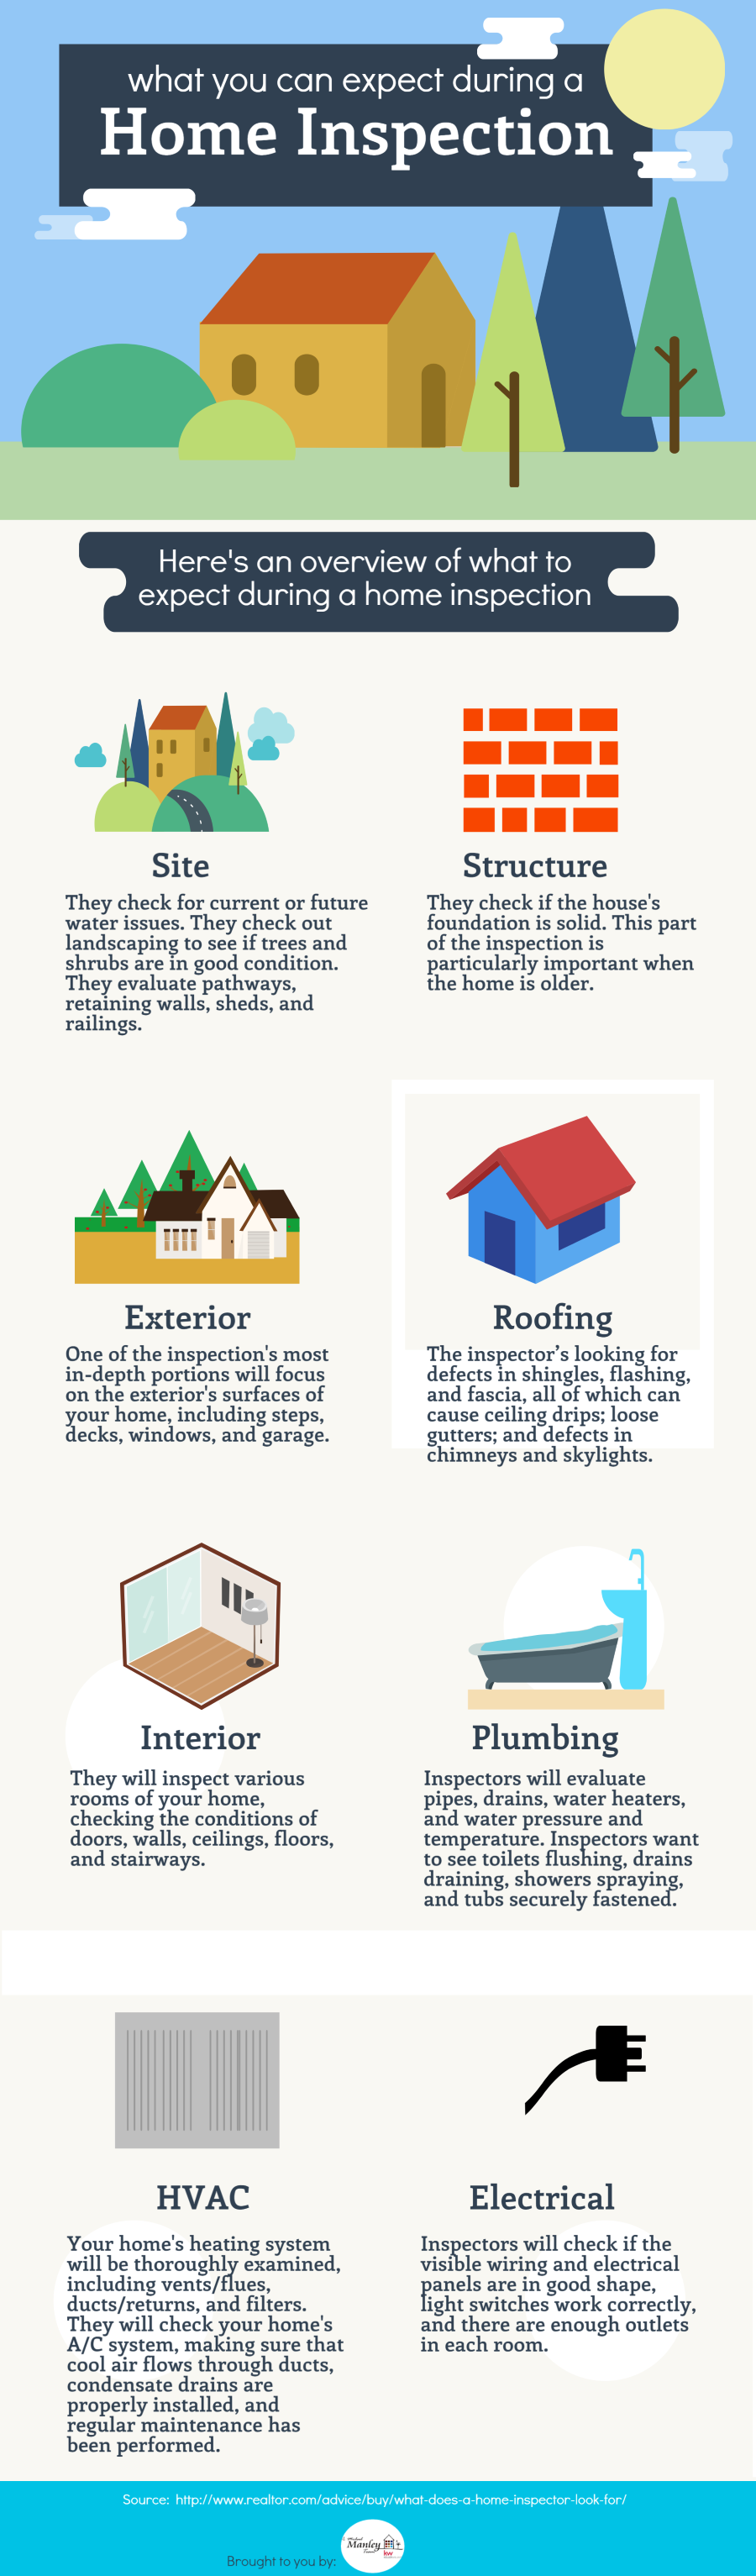 prelisting-home-inspection